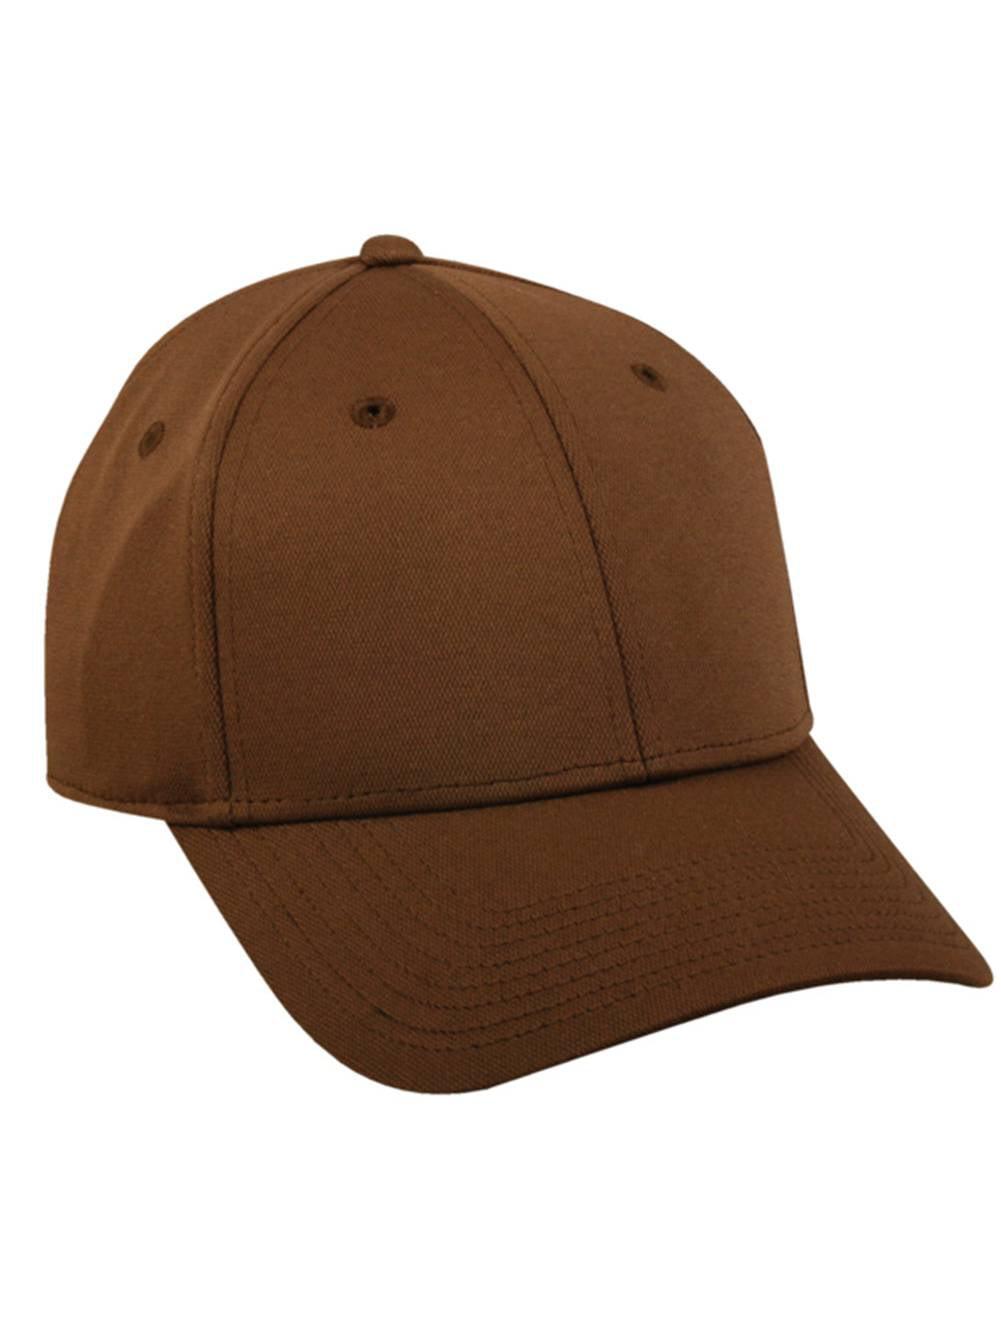 fdc4499b8a7 Flex Fitted Baseball Cap Hat - Brown